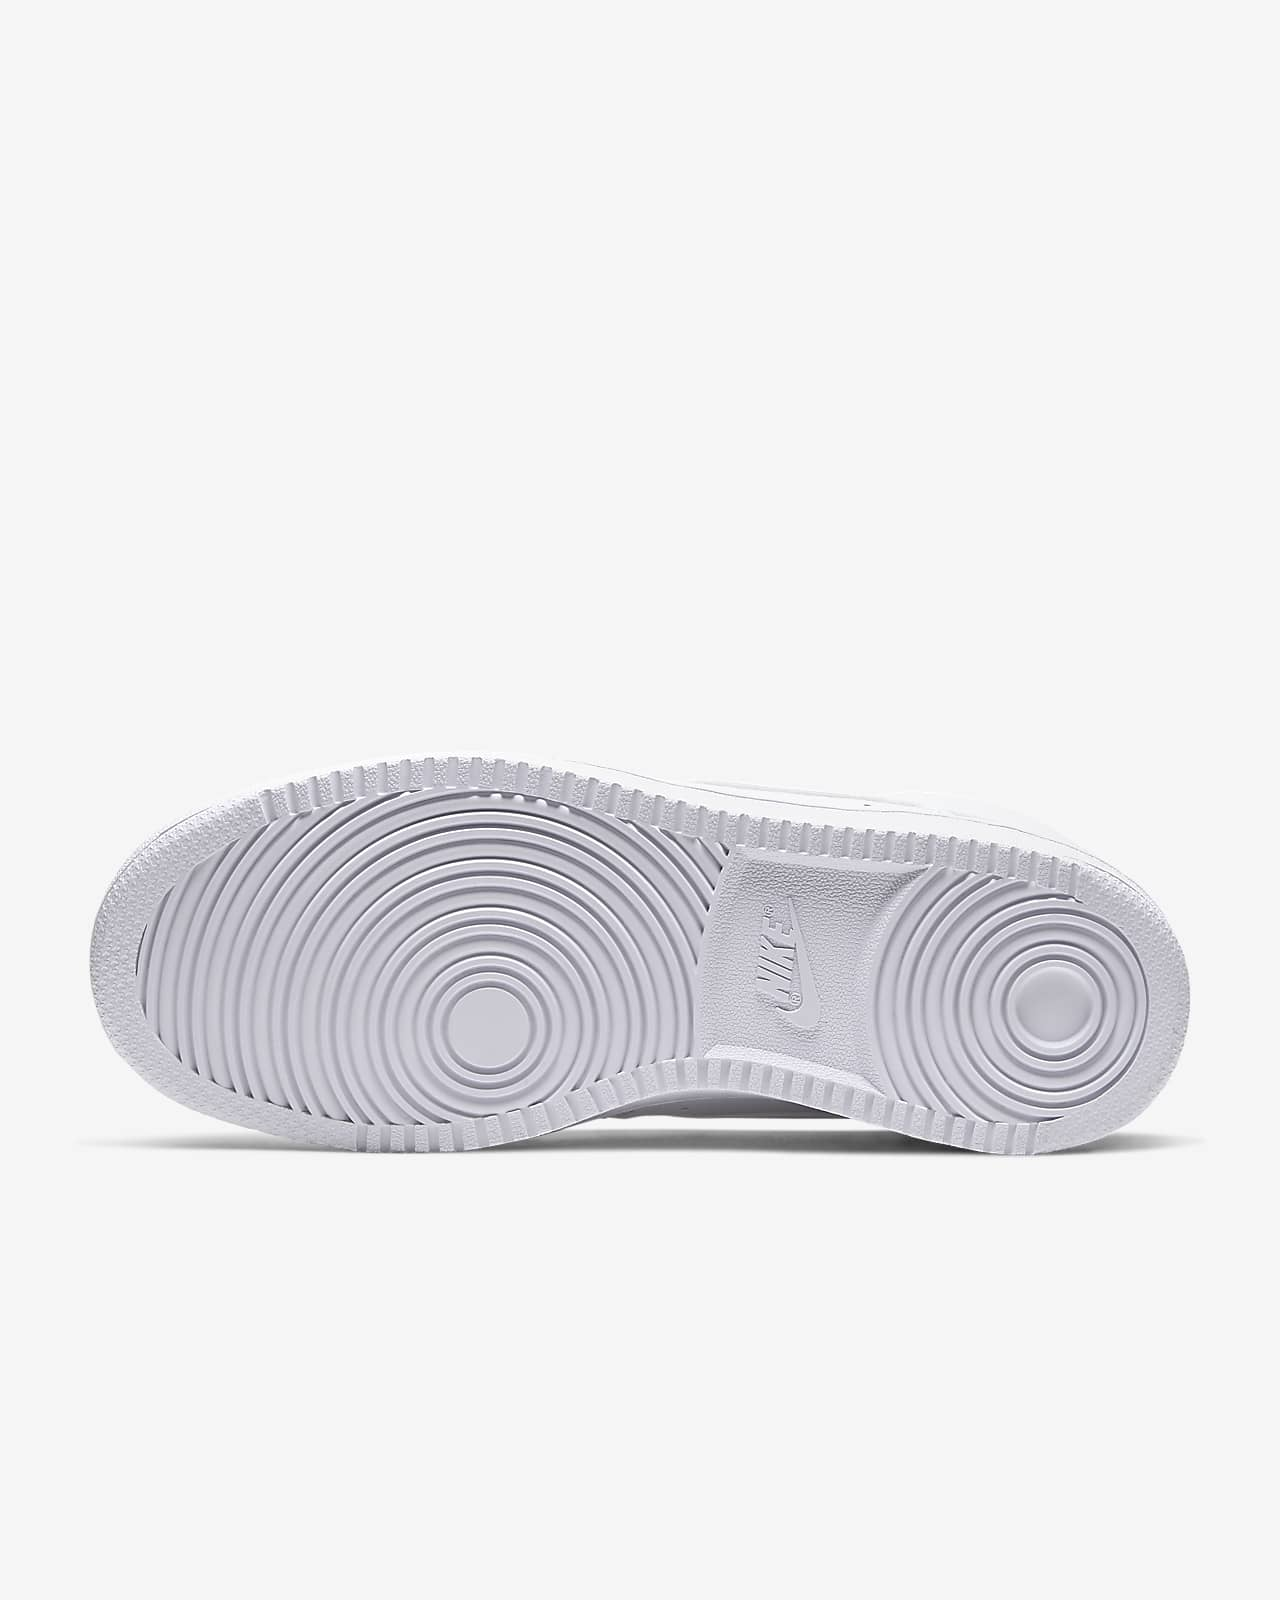 Nike Court Vision Mid Women's Shoe. Nike LU